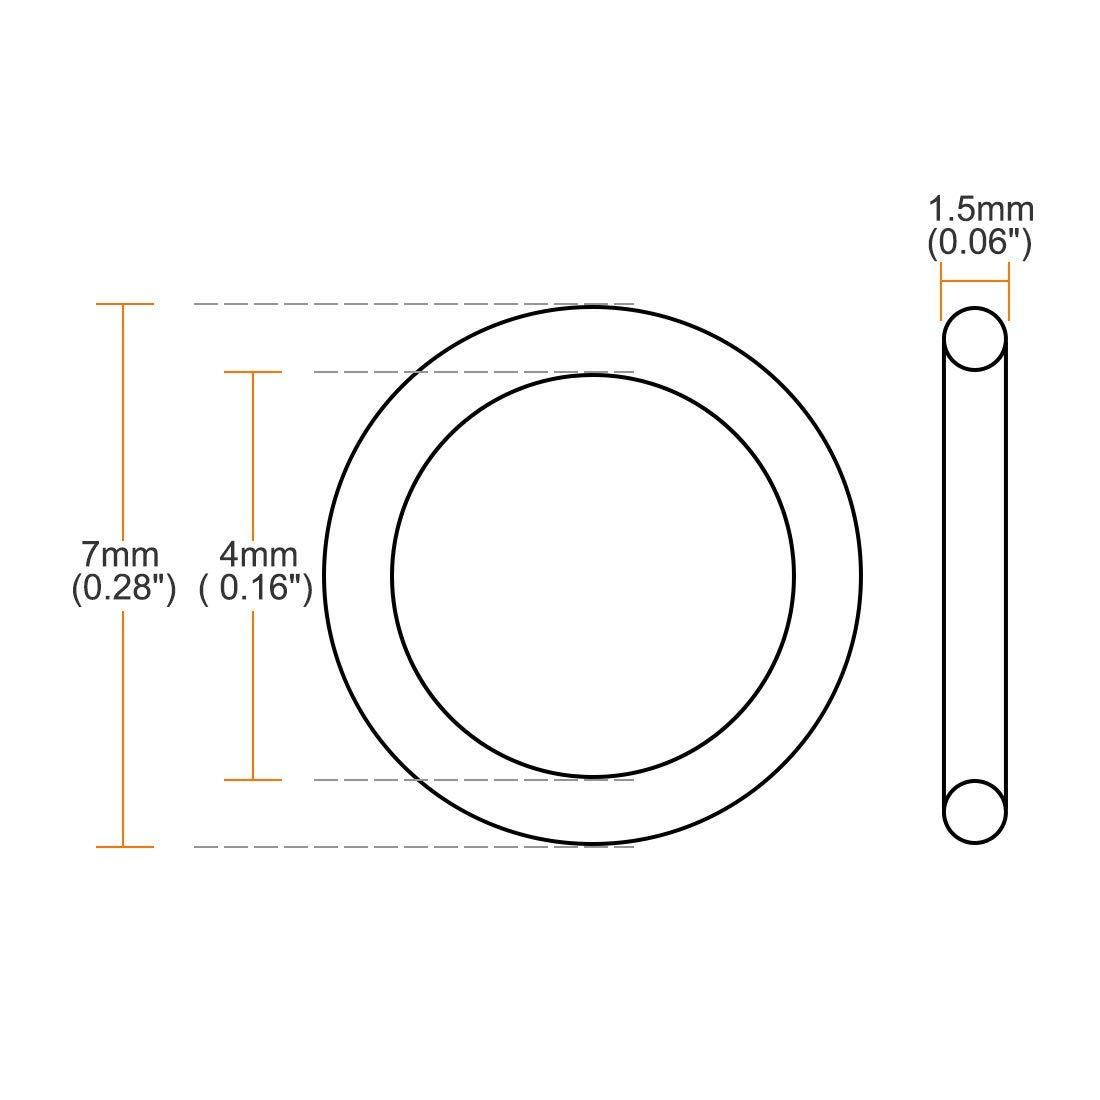 4mm Inner Diameter 7mm OD 1.5mm Width Seal Gasket Green 10Pcs uxcell Fluorine Rubber O Rings